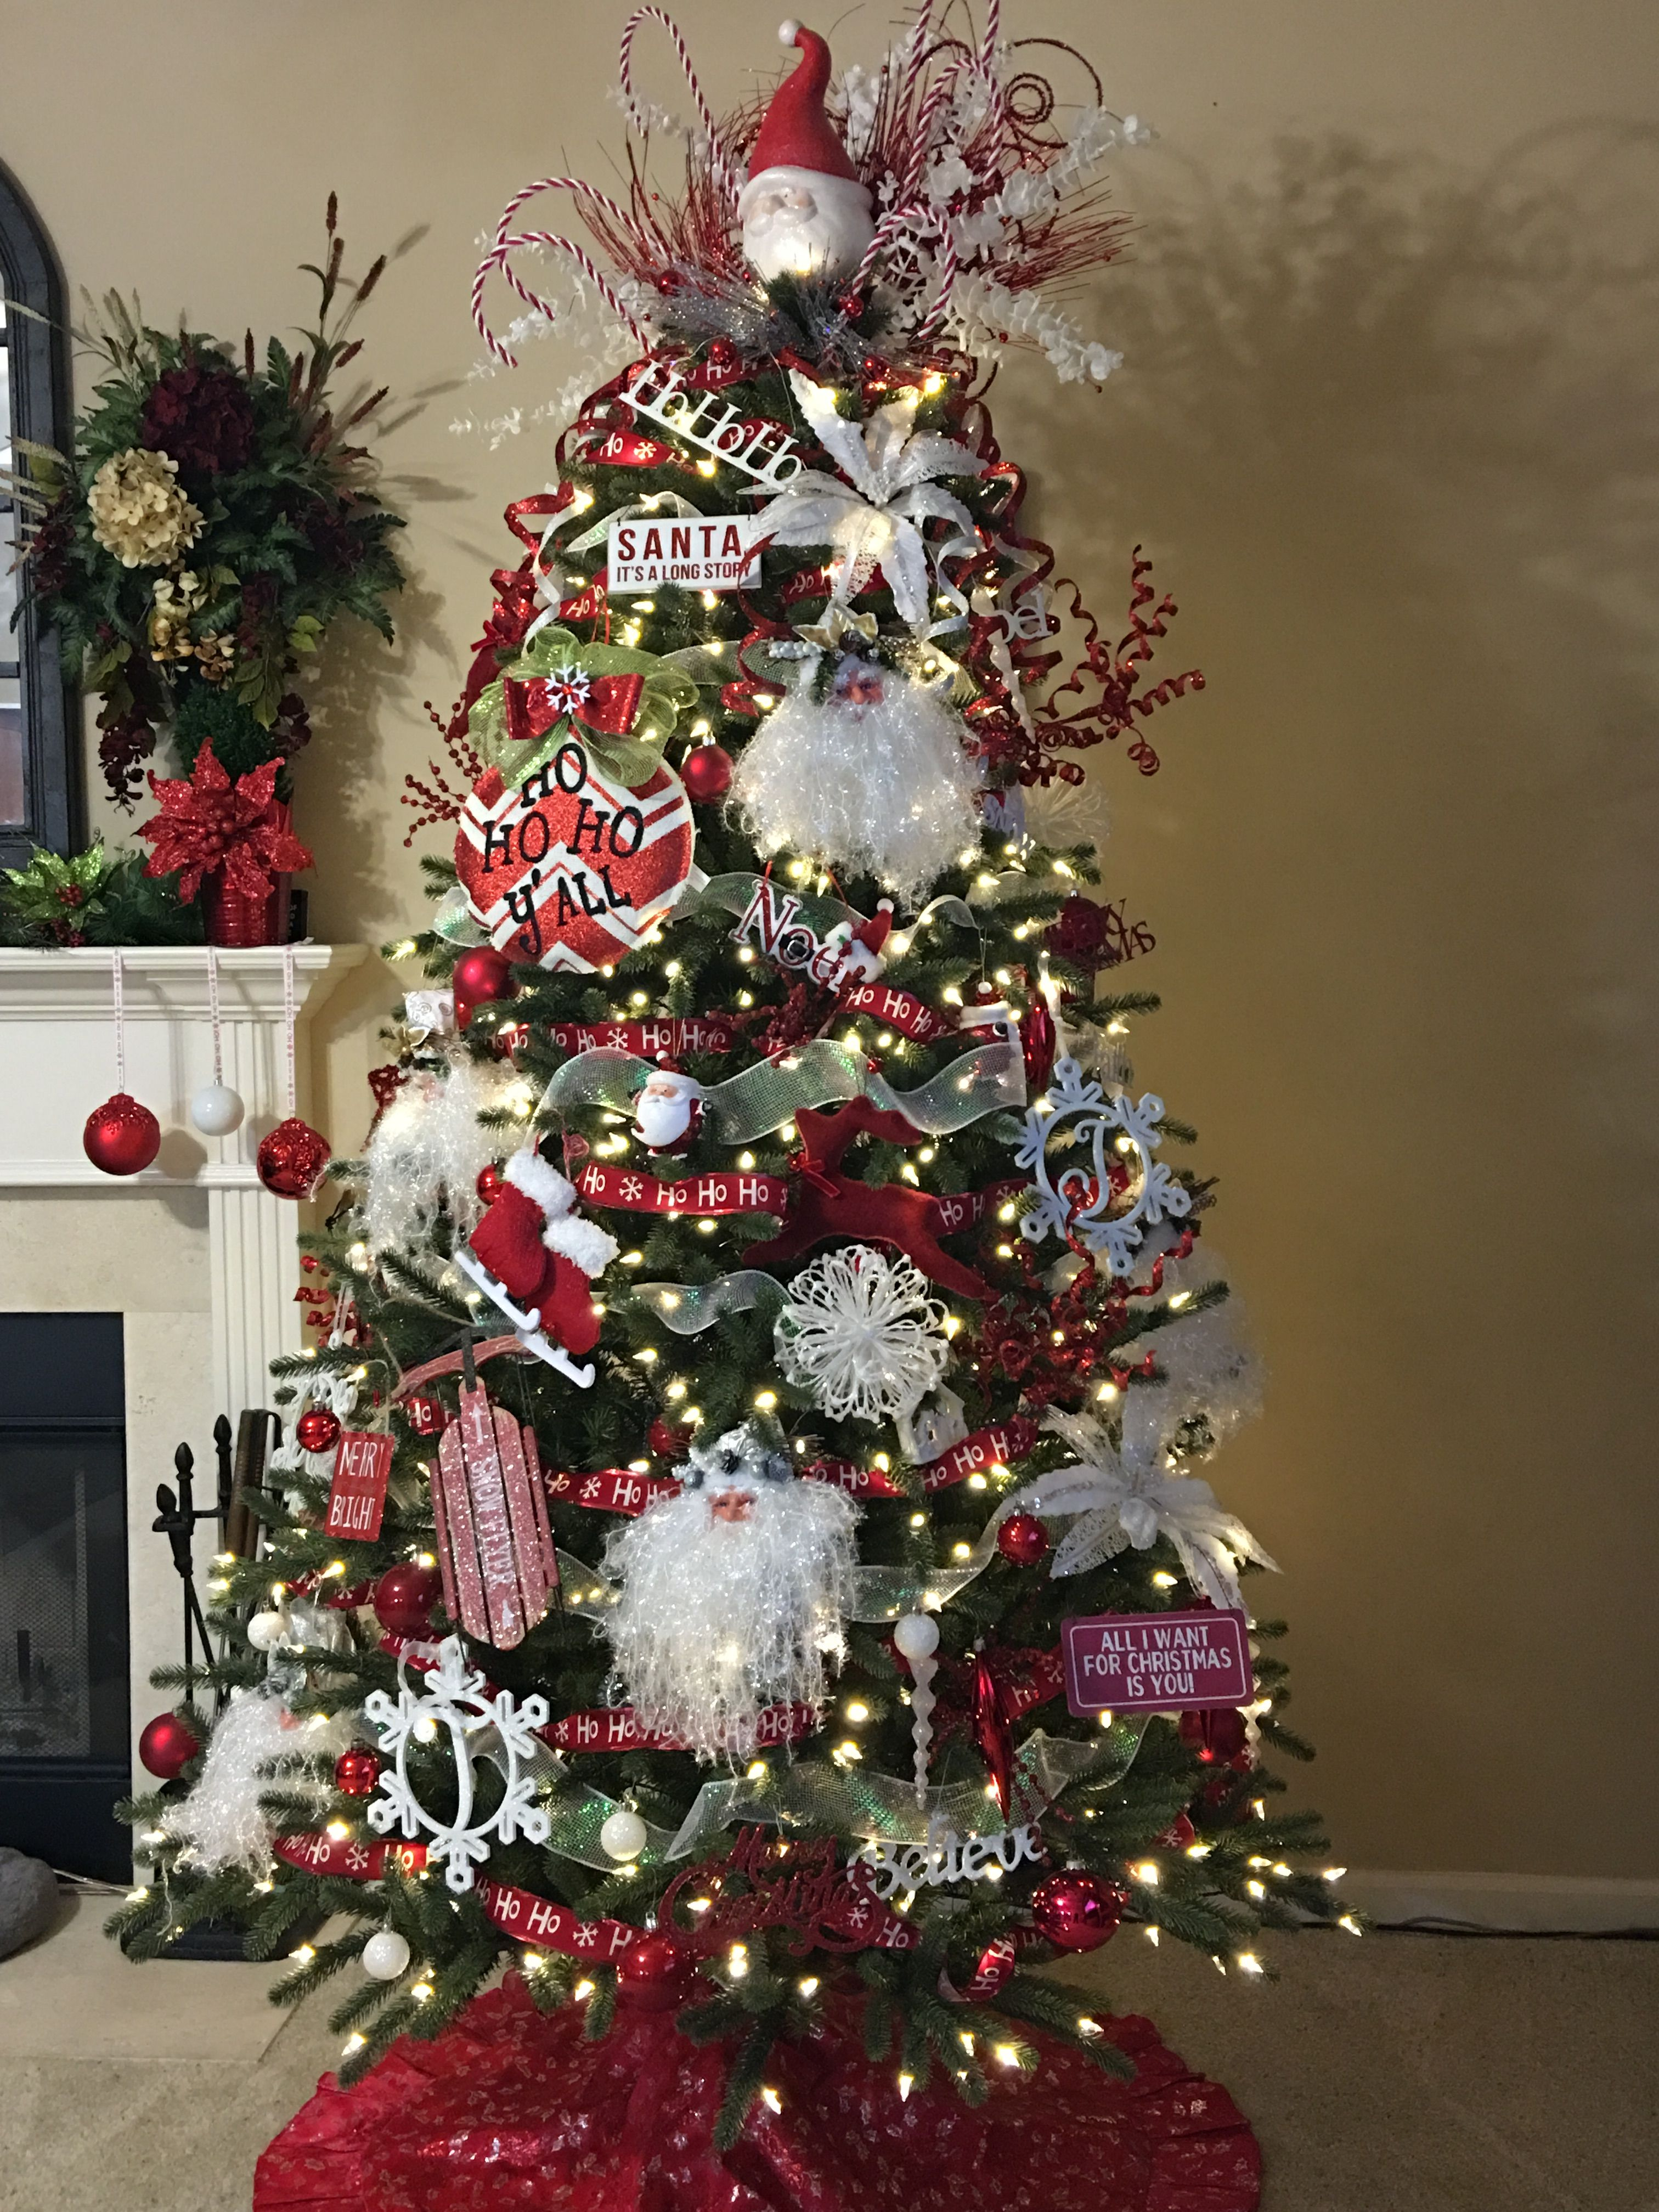 Santa Themed Christmas Tree Topper Done Ceramic Santa That Has A